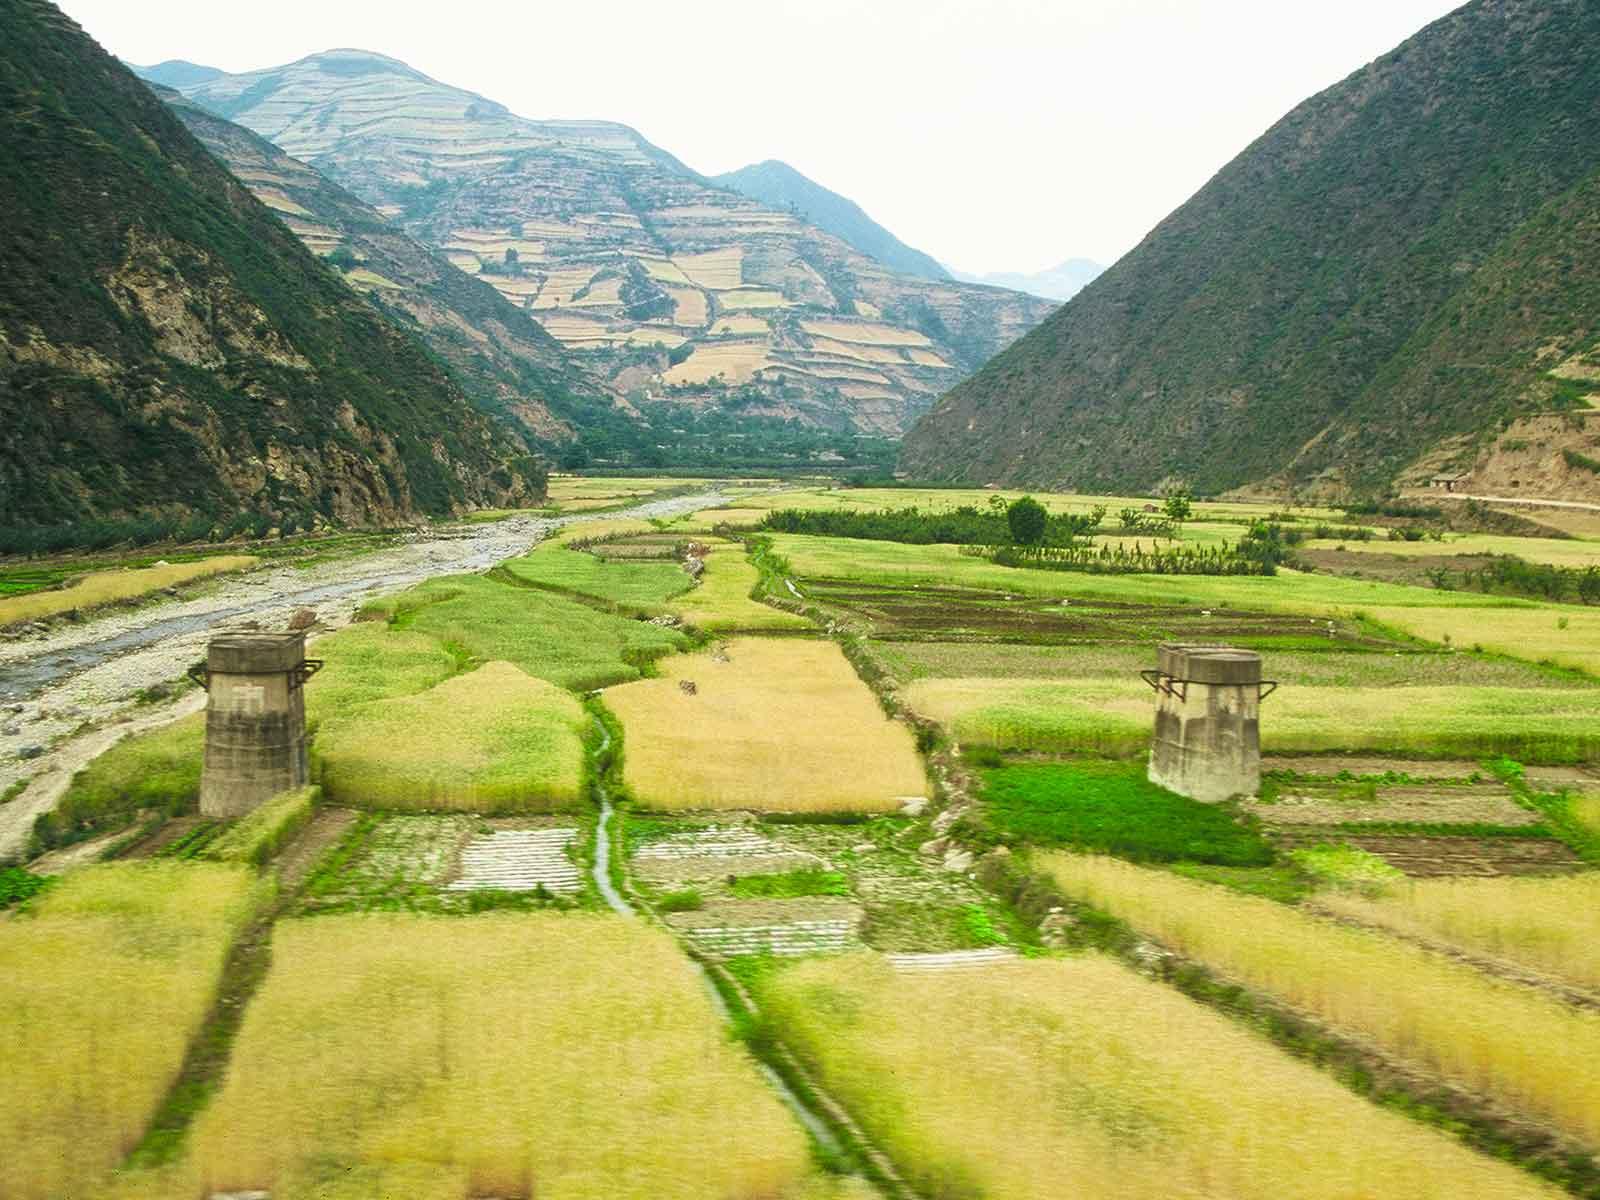 Train travel - Xian to Jiayuguan - Silk Road Photo Journal - Dr Steven Andrew Martin - Study Abroad Research